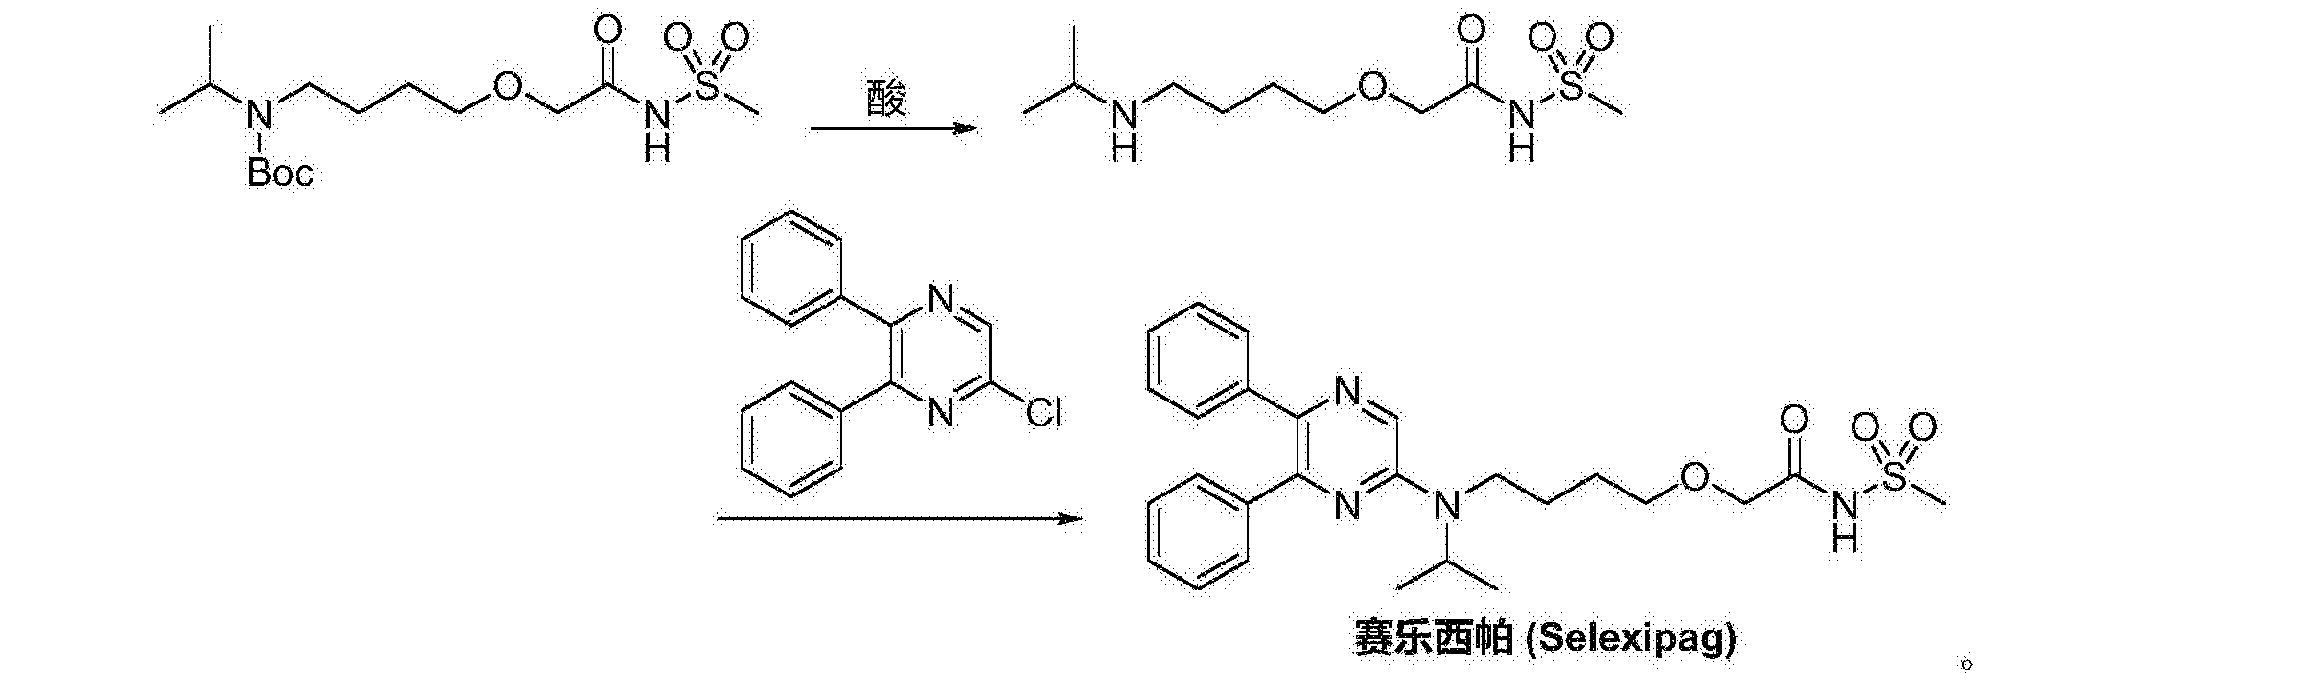 Figure CN105949135AD00083